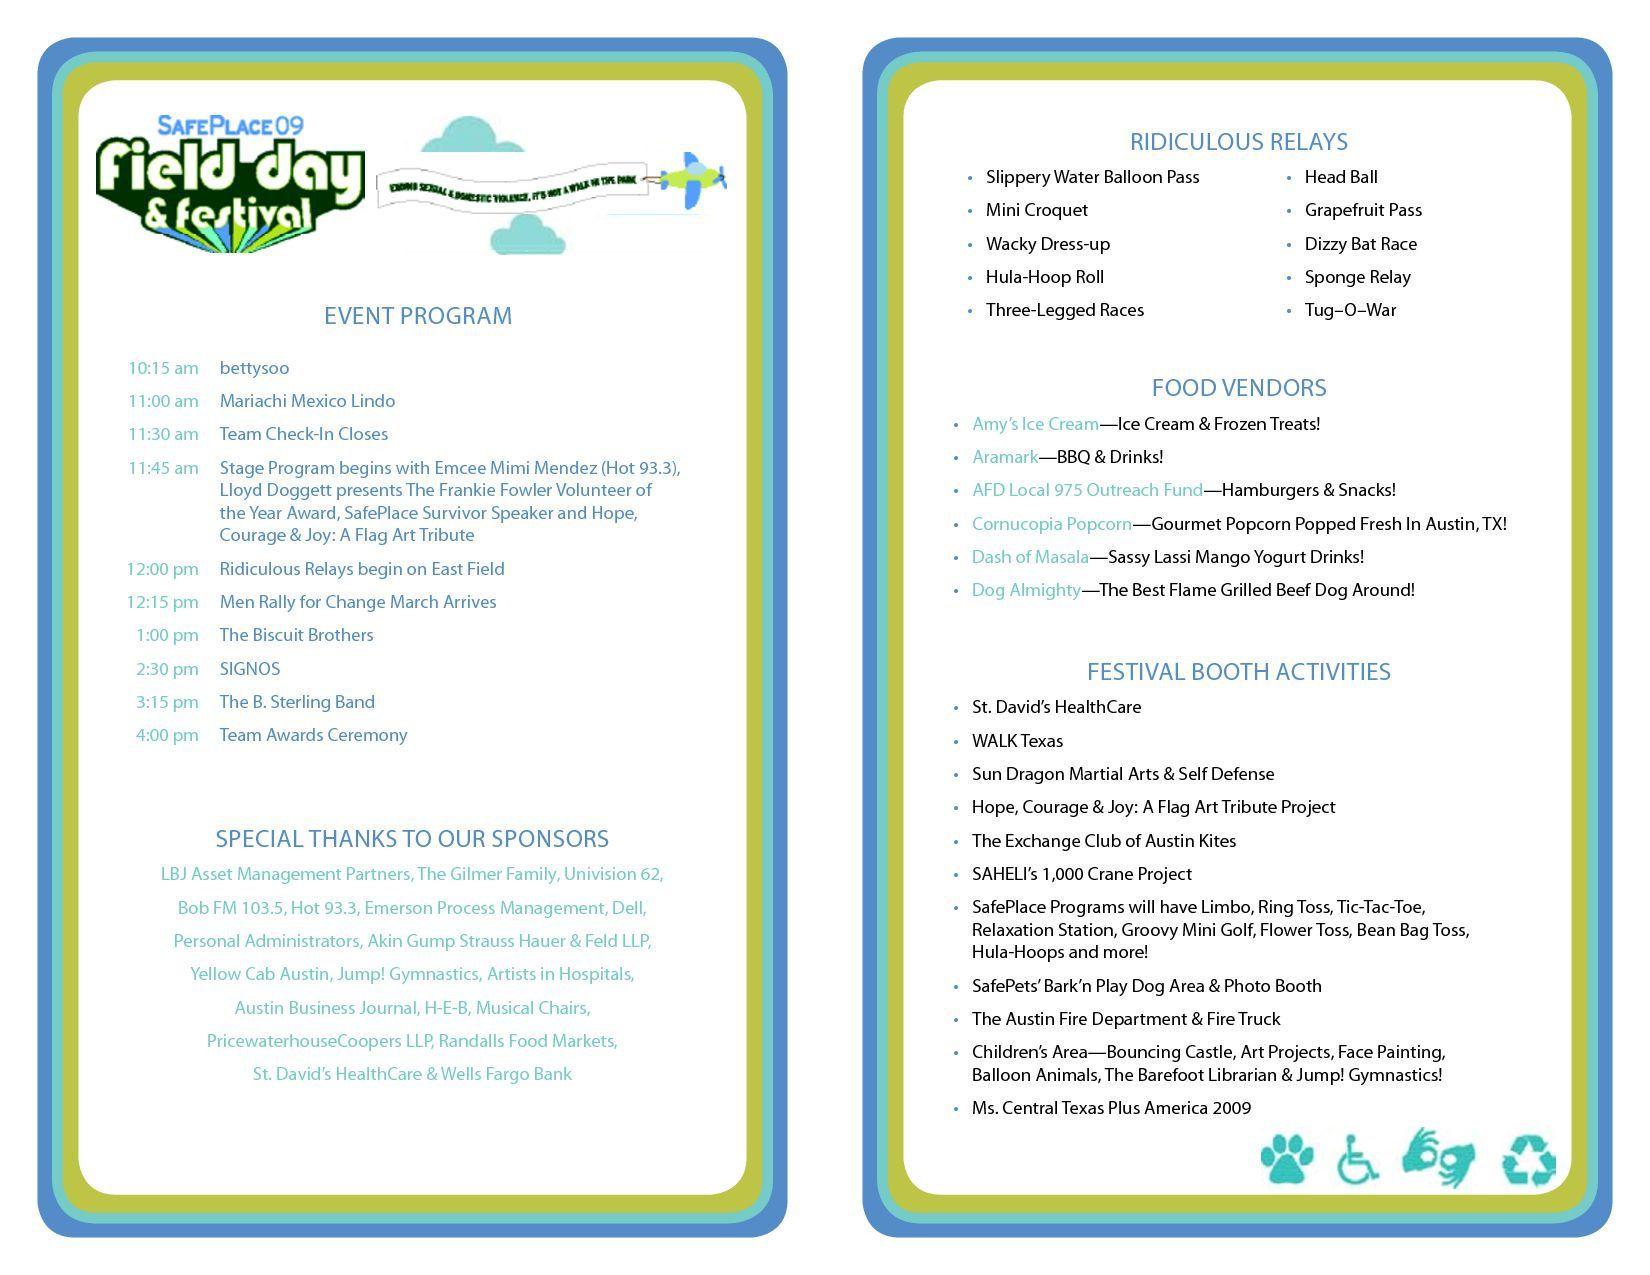 003 Breathtaking Printable Event Program Template High Definition  Free DownloadFull